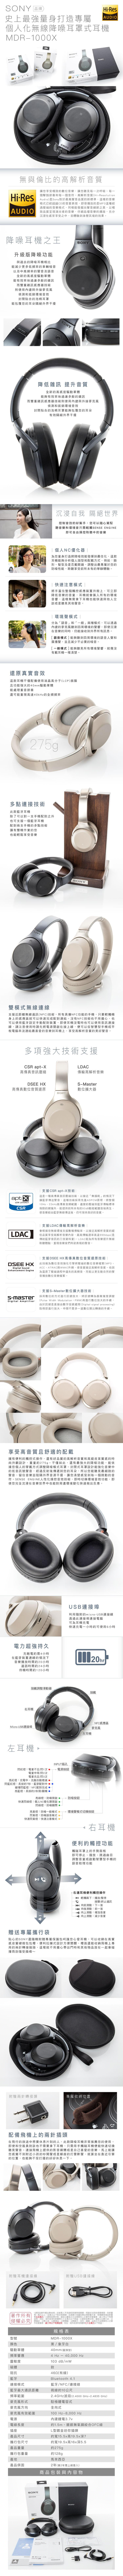 headset_33 - 複製